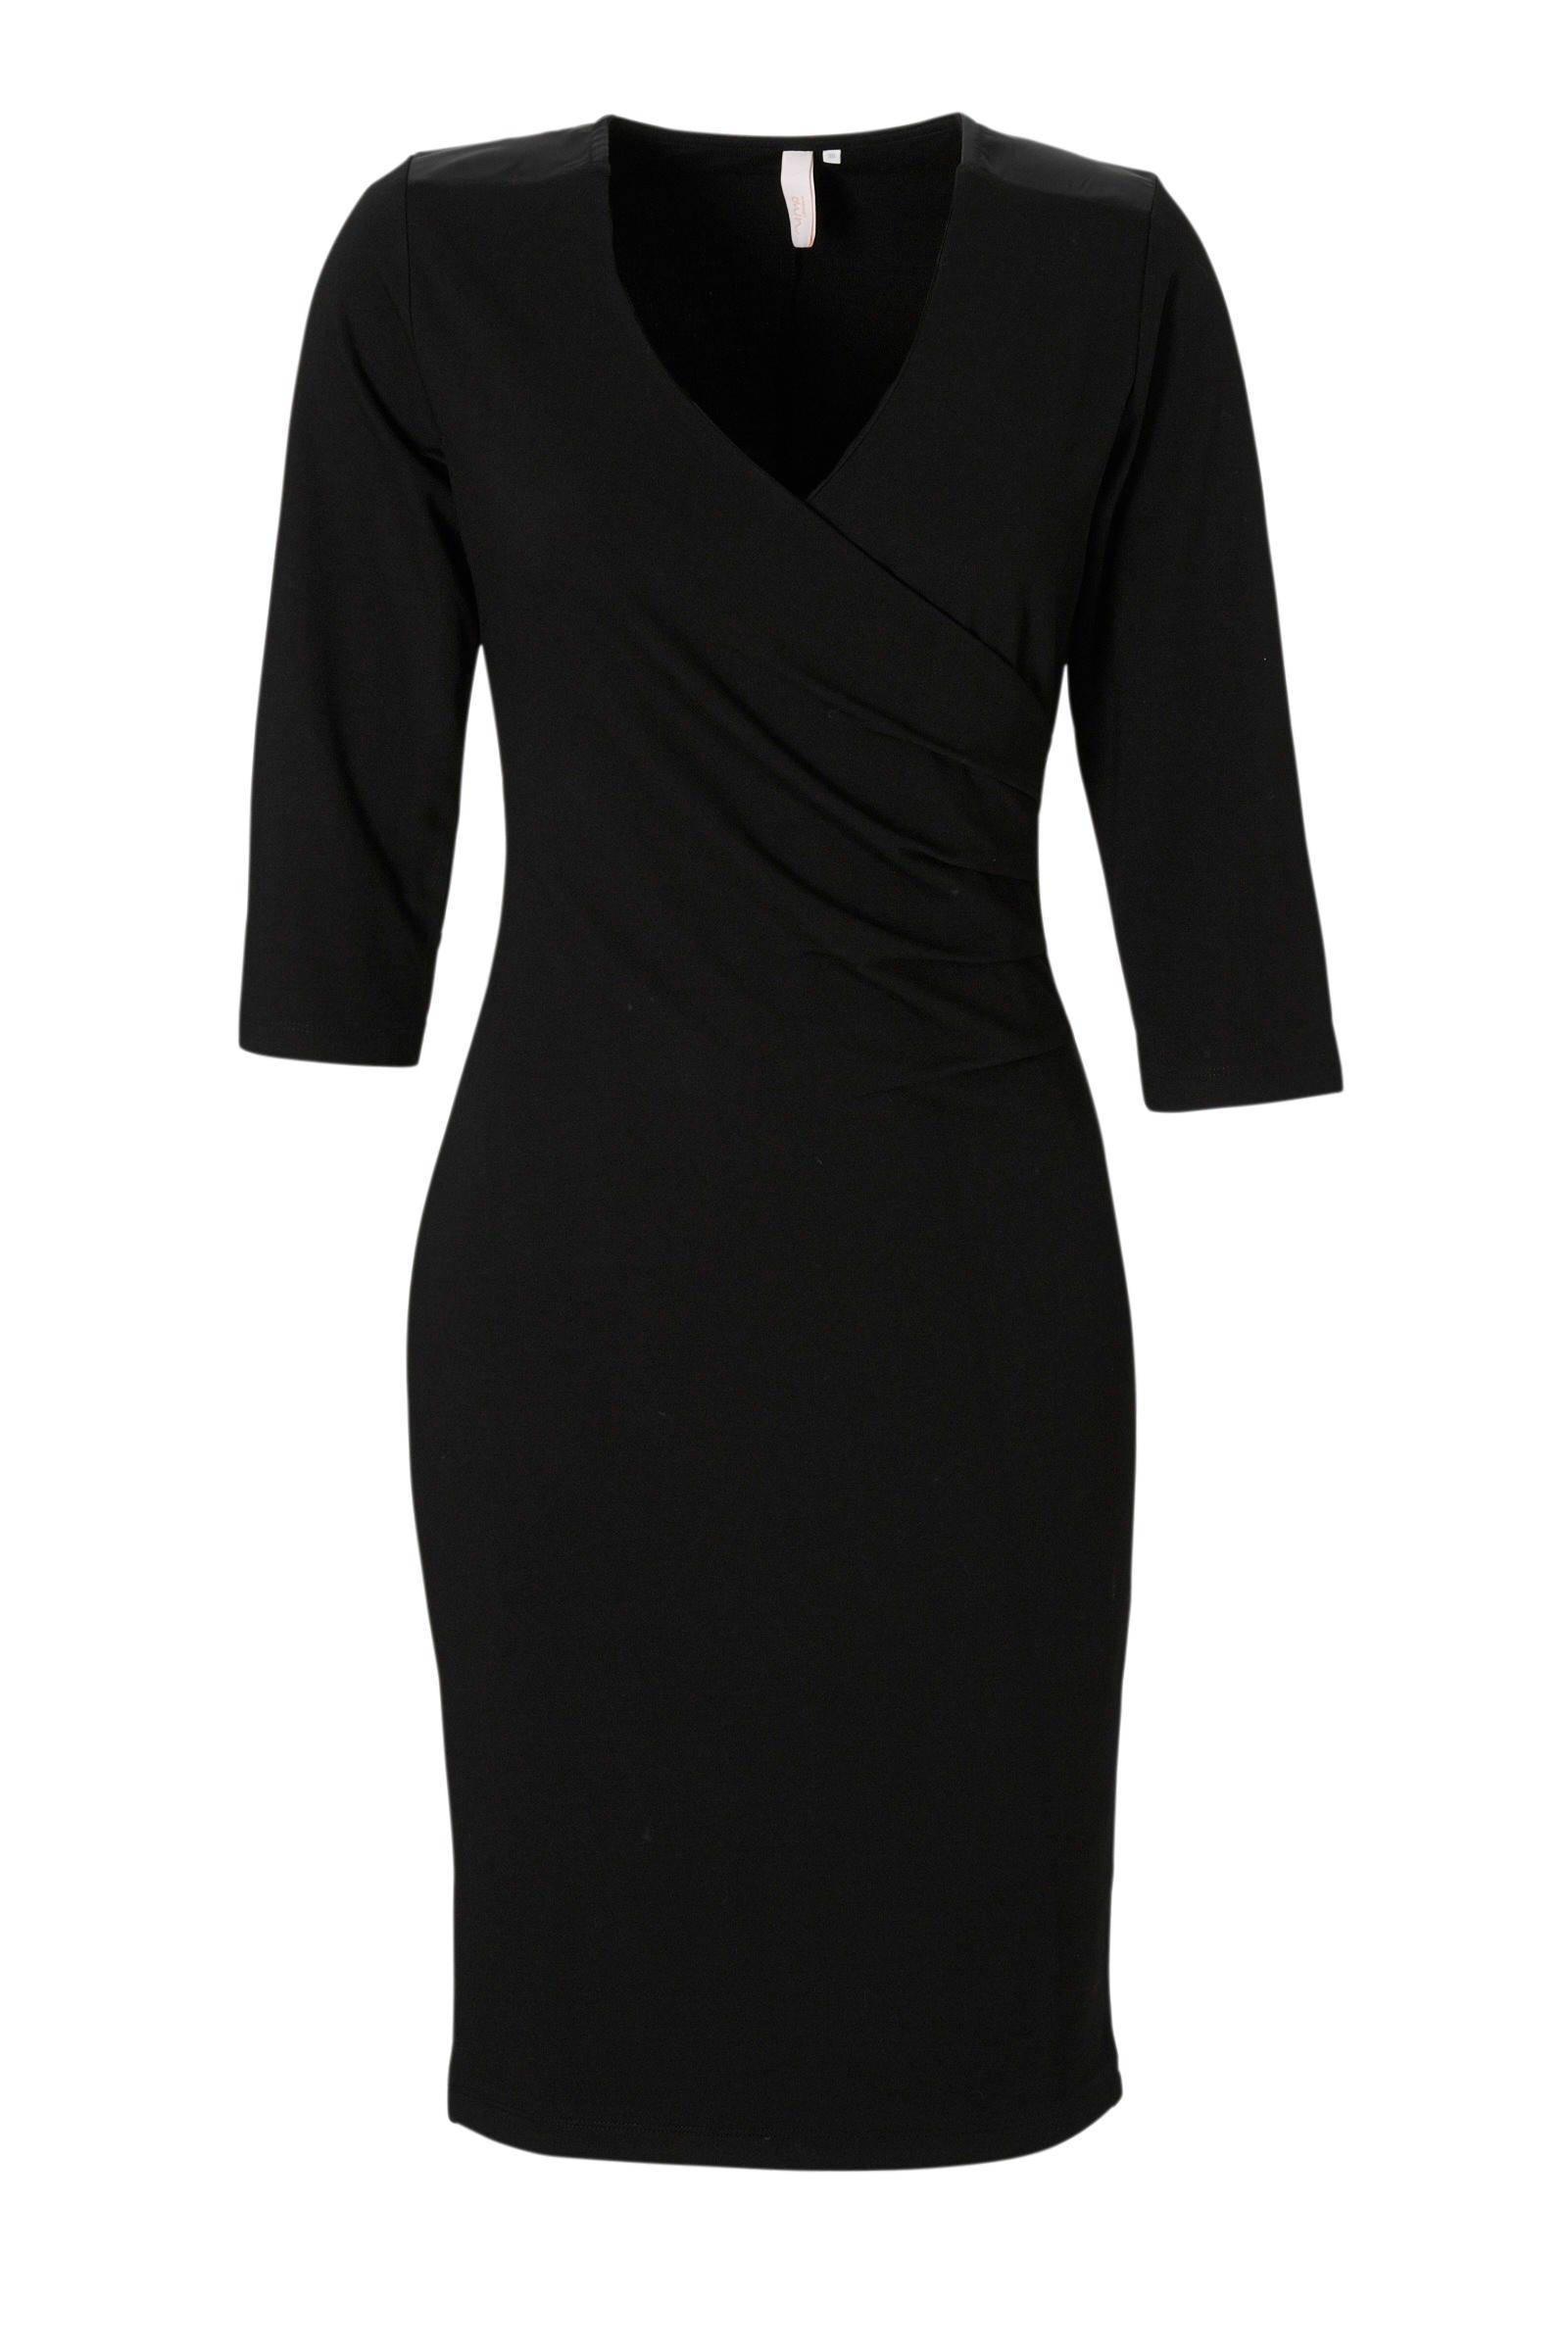 Genoeg whkmp's own jurk | wehkamp &MP02